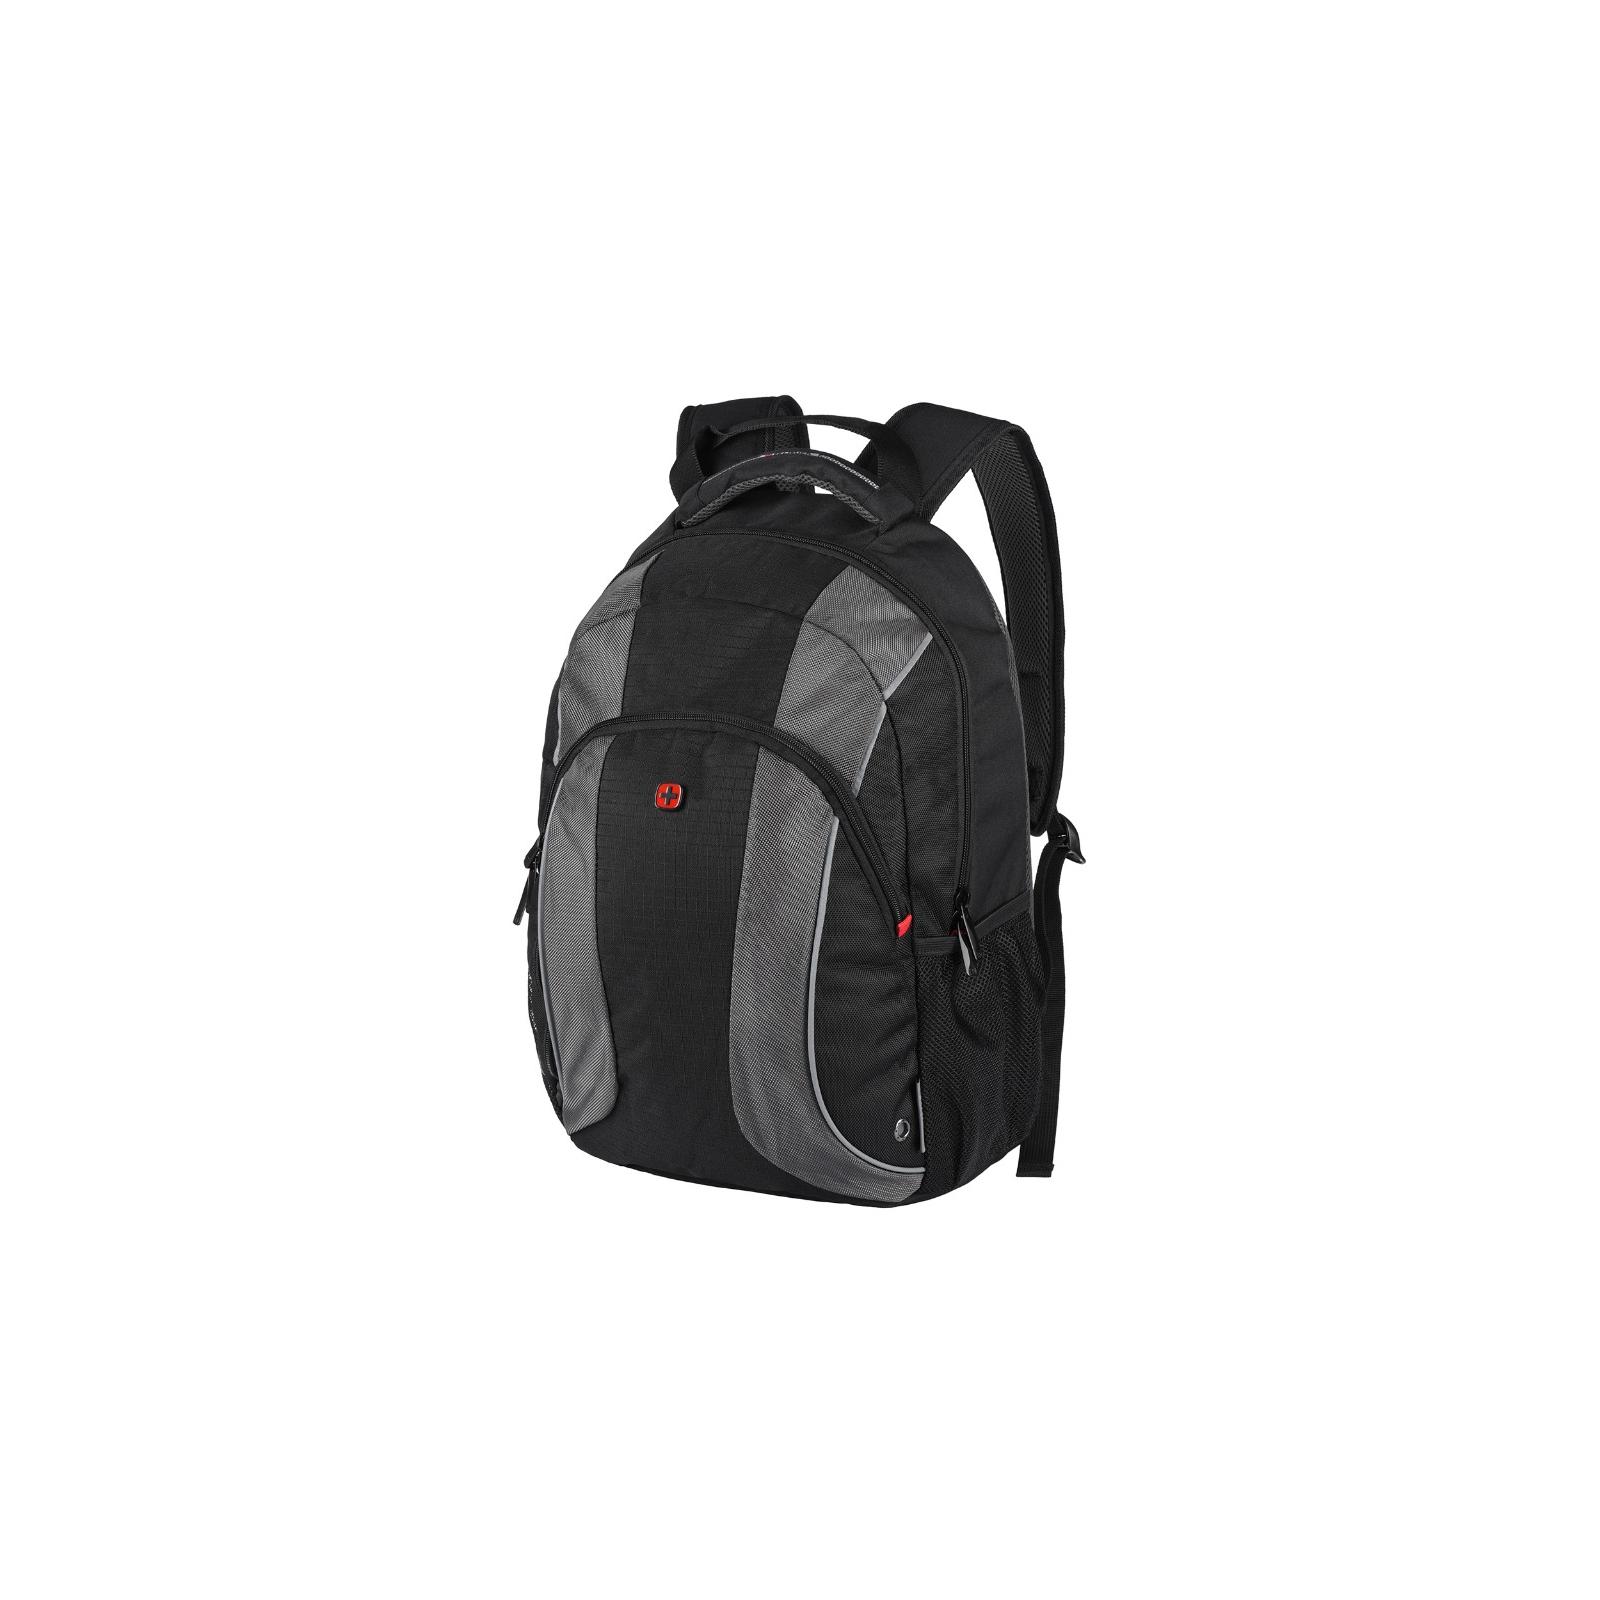 "Рюкзак для ноутбука Wenger 16"" Mercury Black (604433)"